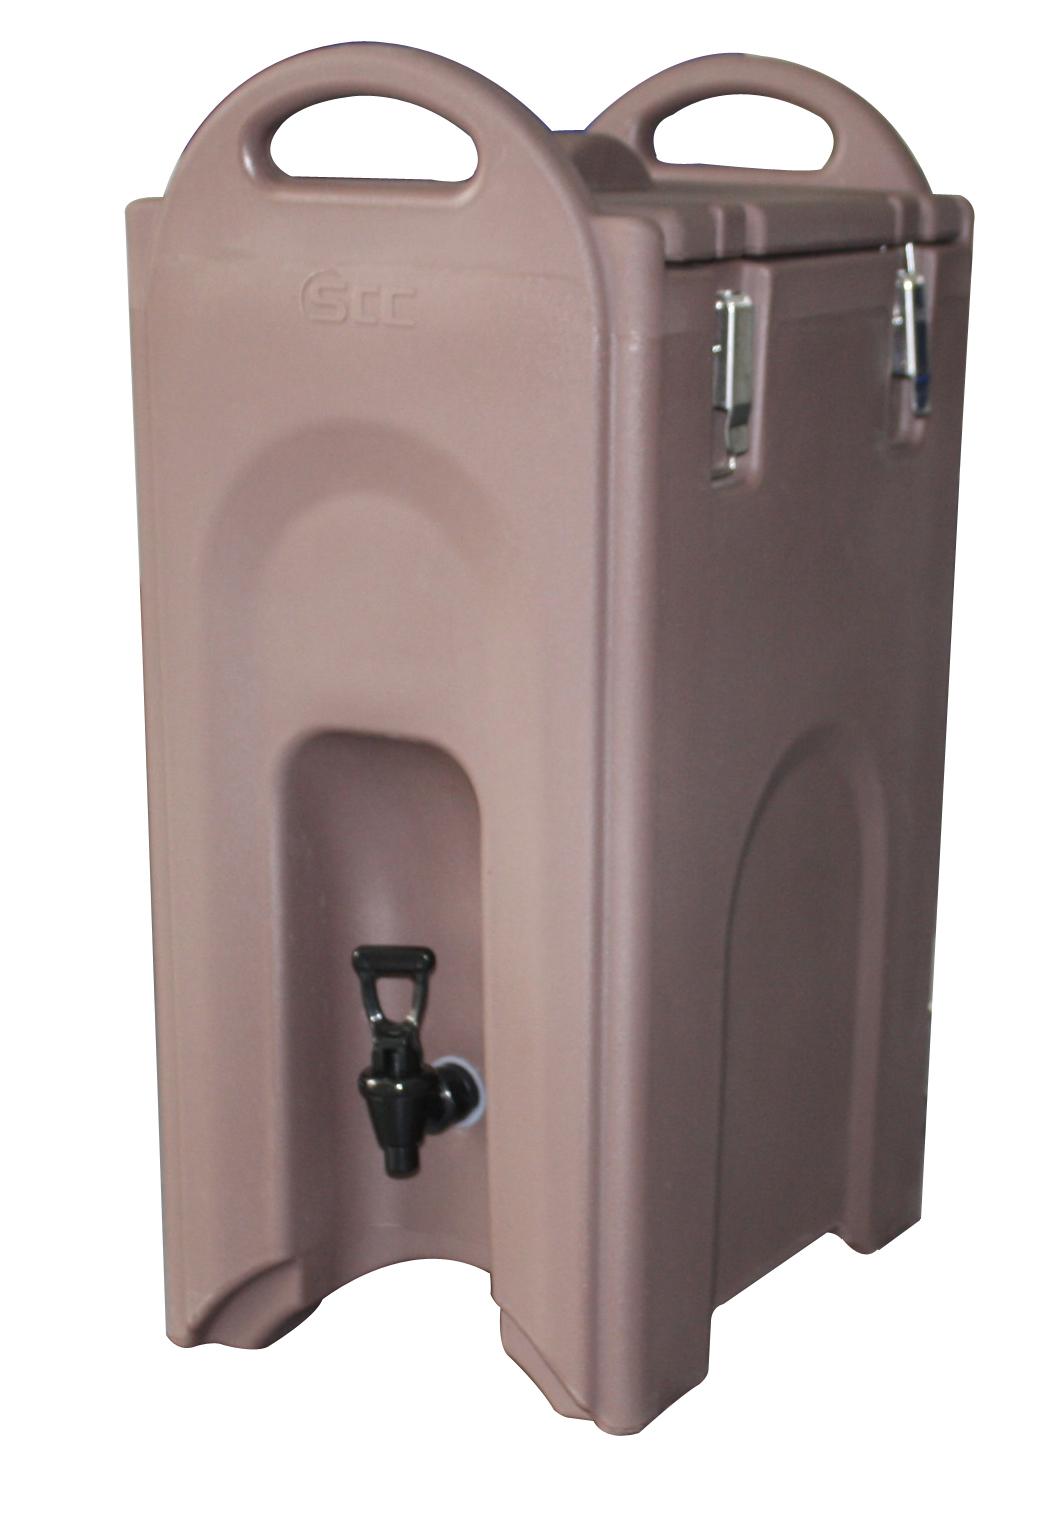 SB3-A18饮料桶